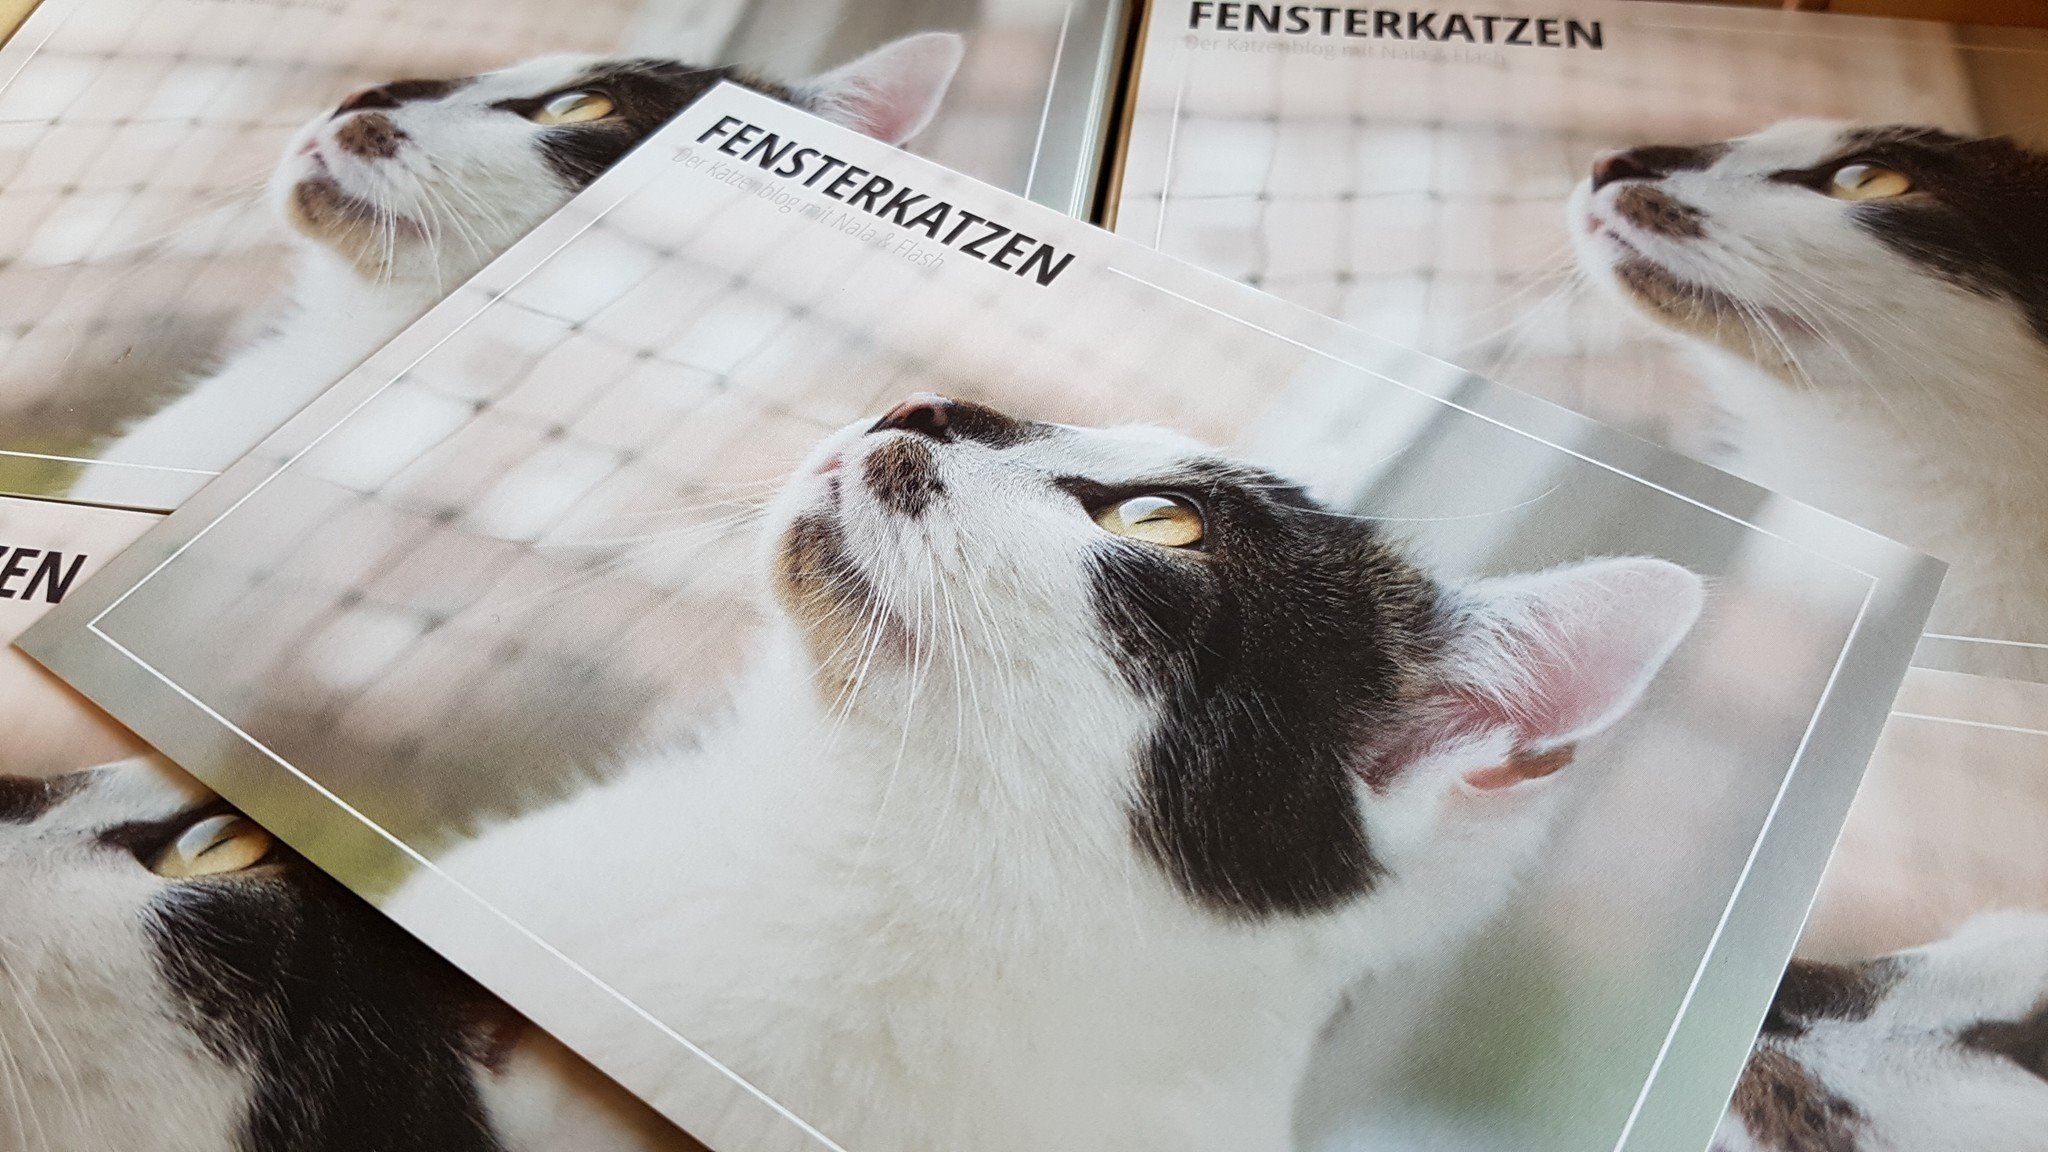 Fensterkatzen-Alltag-Jahresrueckblick-2018-Postkarte-front